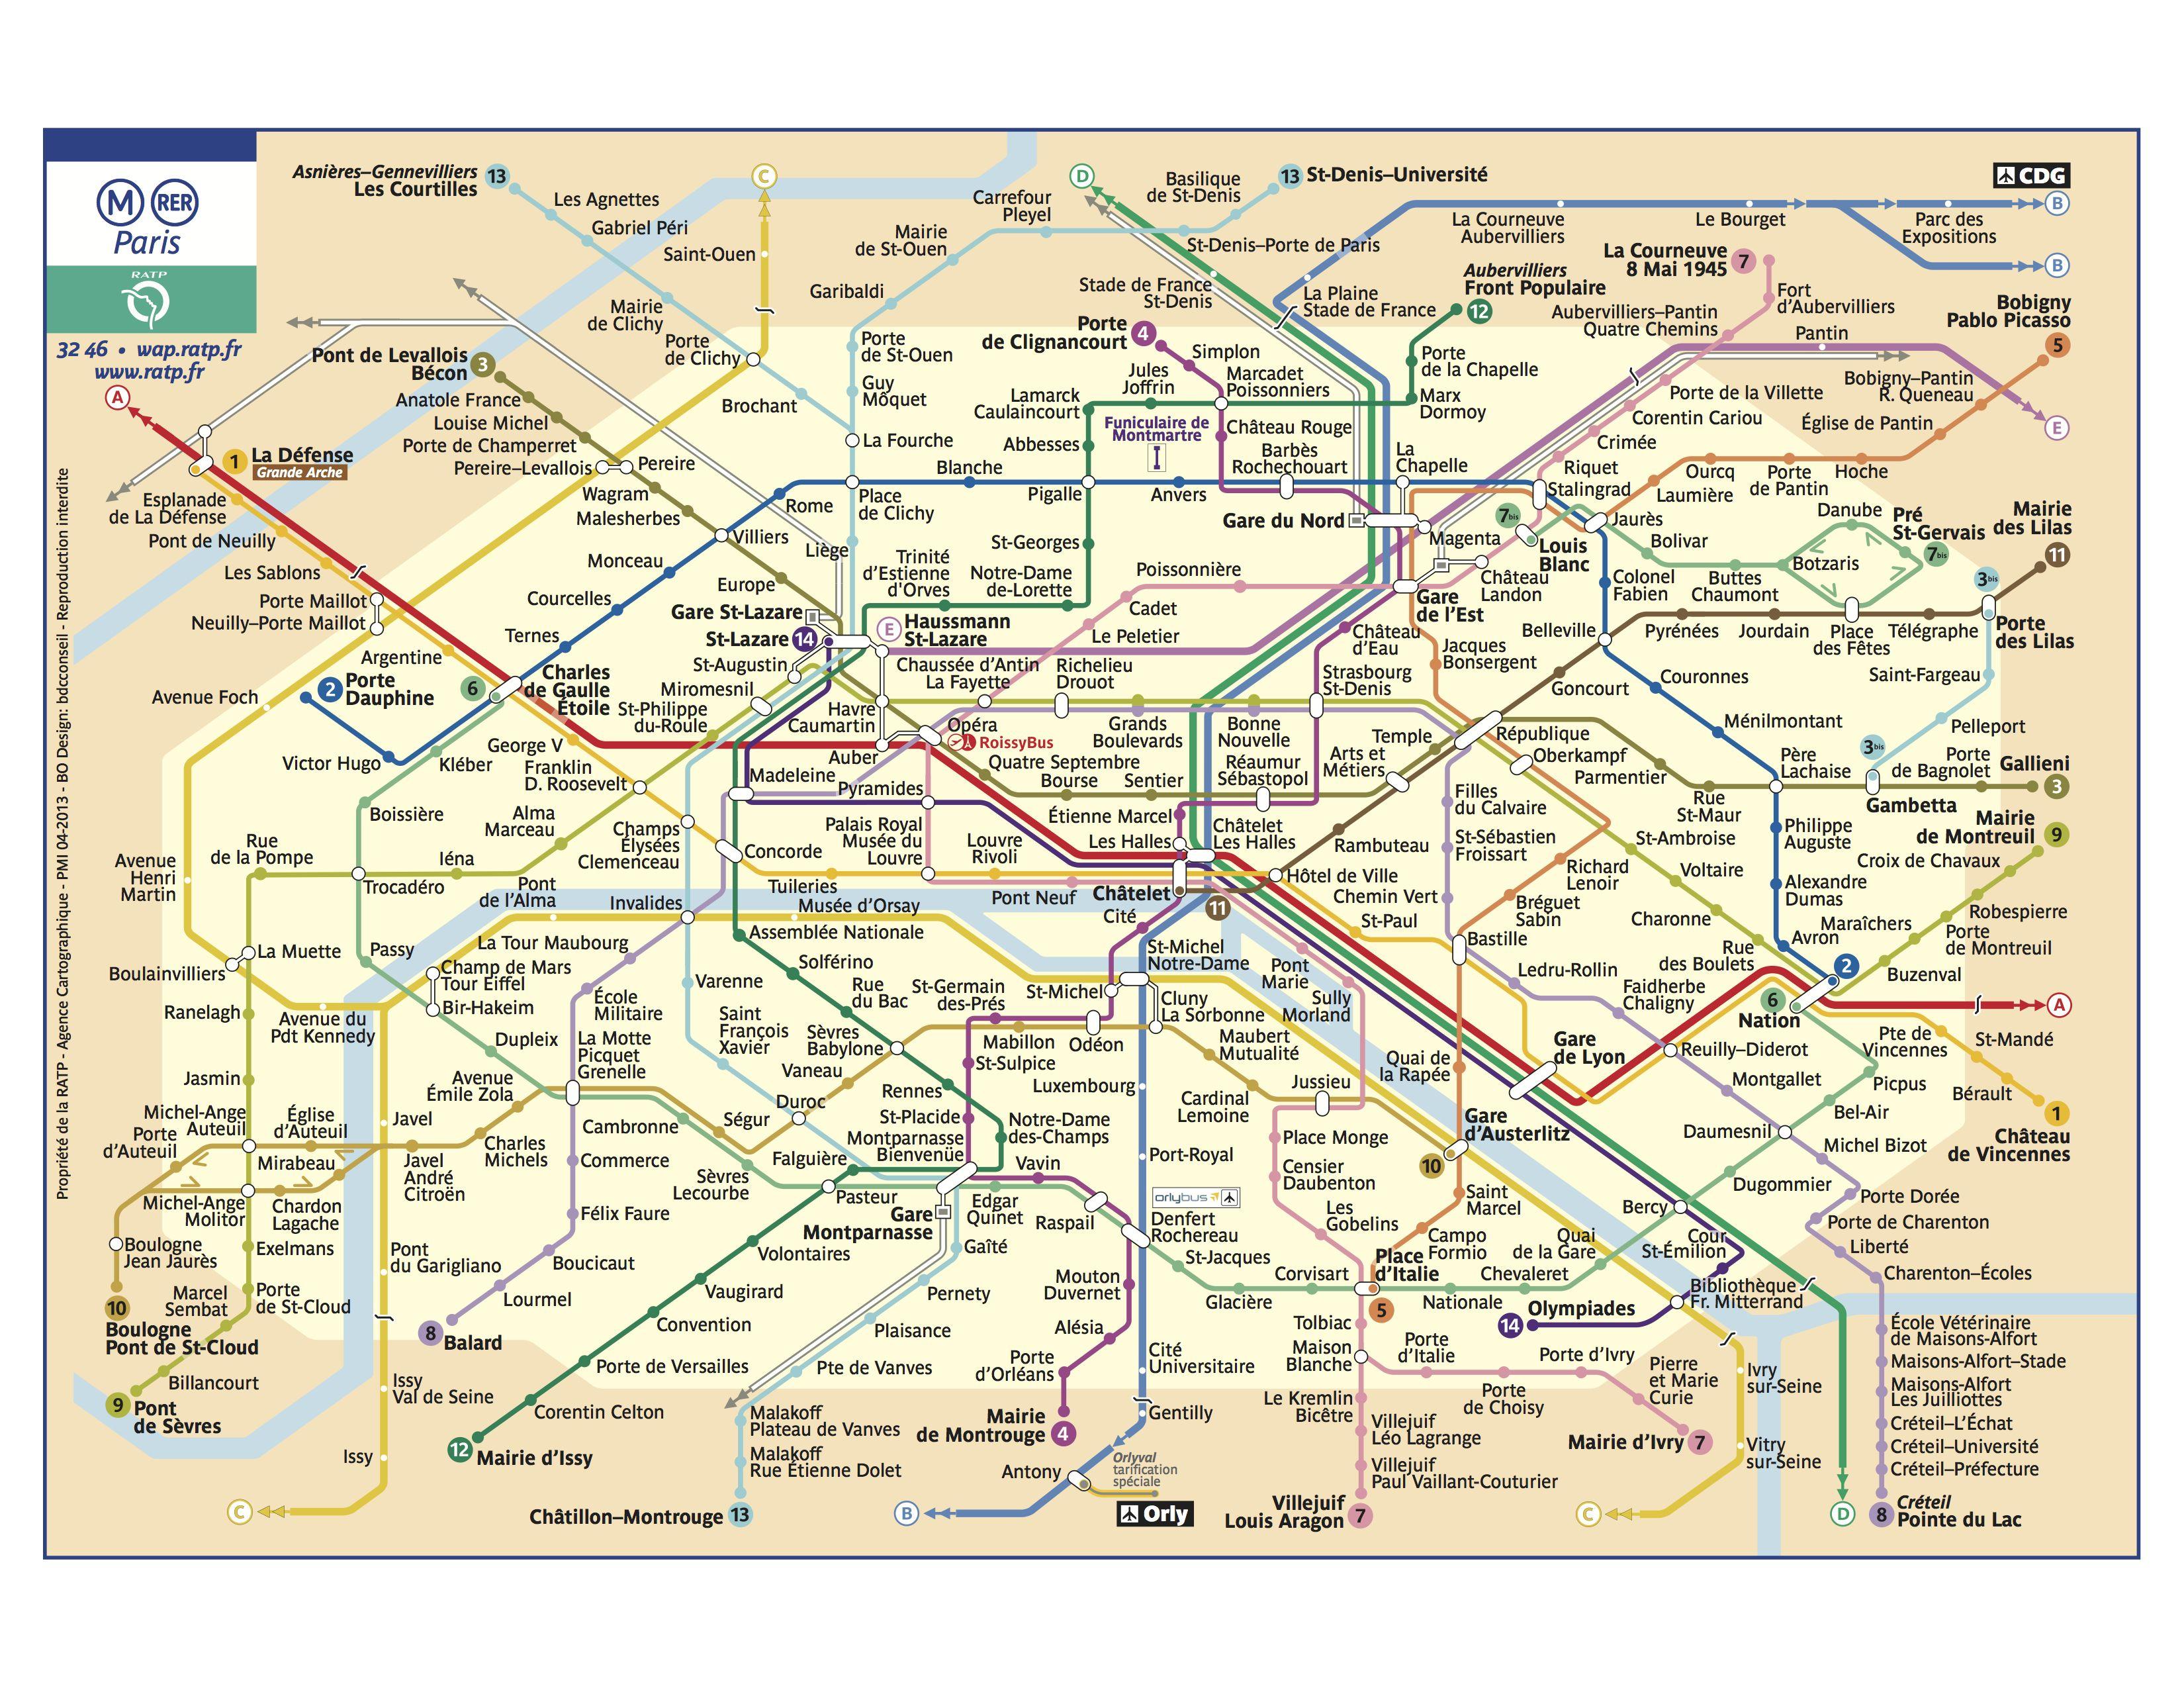 Map Subway Paris.This Ratp Paris Metro Rer Map Covers All 14 Metro Lines 16 If You Include The Bis Lines And The 5 Regional Train Line Paris Metro Map Paris Metro Paris Map